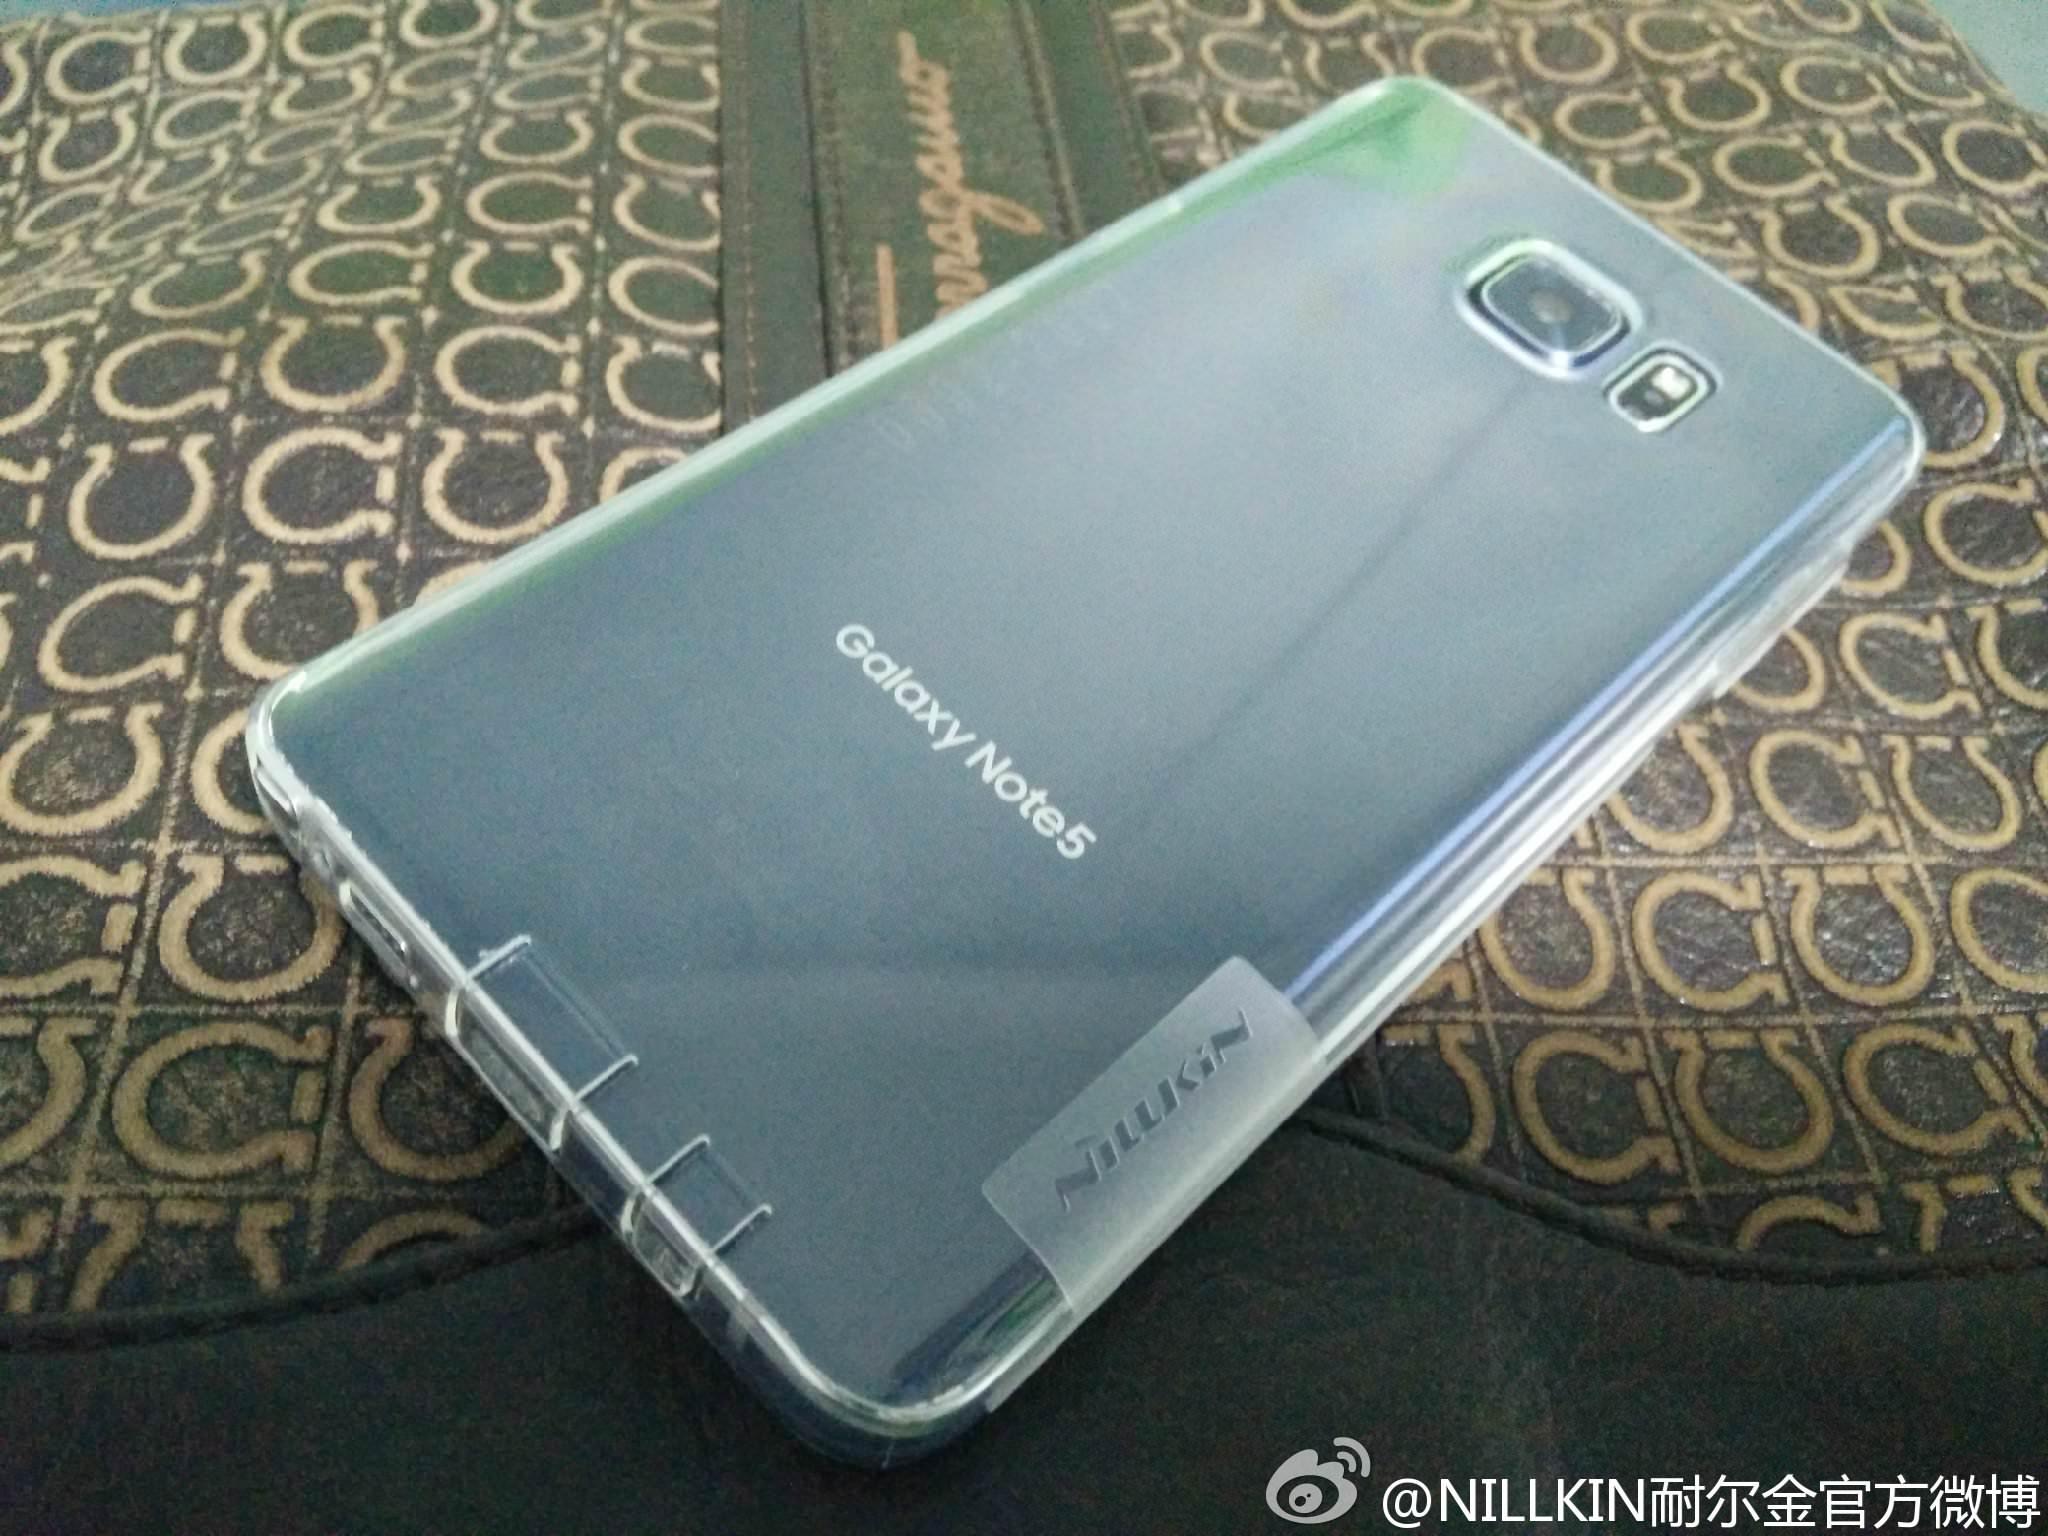 Galaxy Note 5'in yeni detayl� foto�raflar� geldi